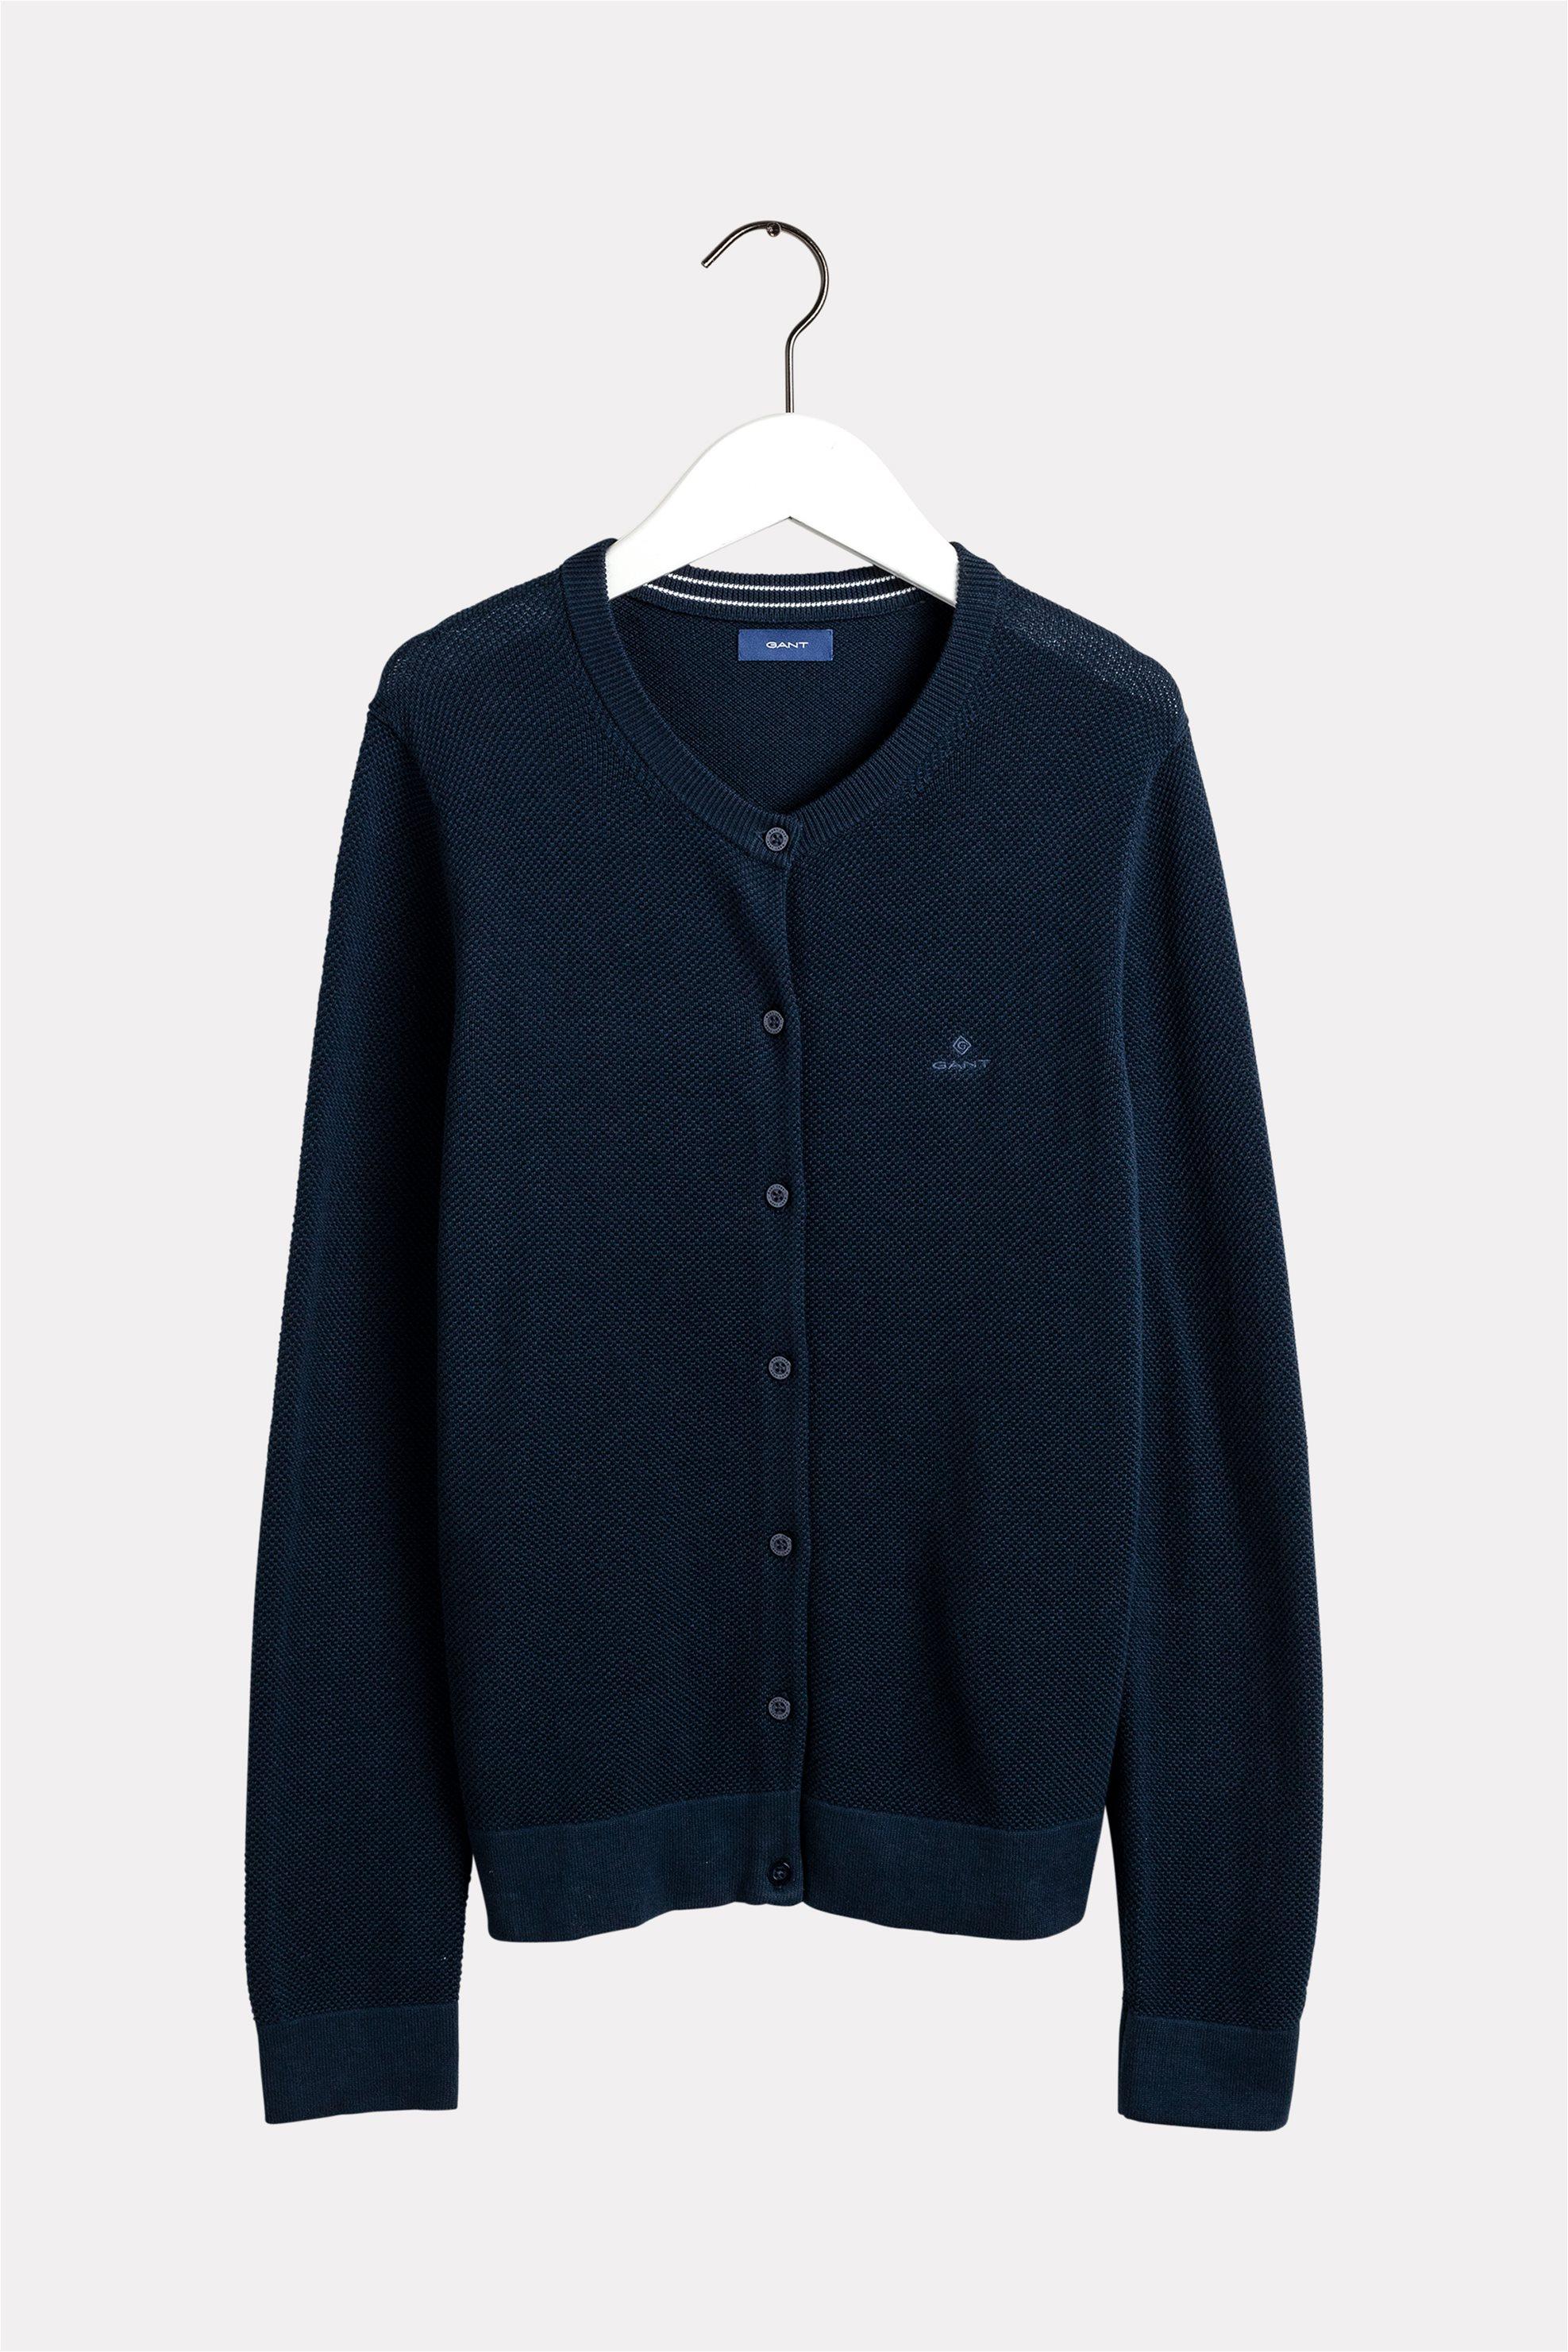 Gant γυναικεία πικέ ζακέτα μονόχρωμη - 4800505 - Μπλε Σκούρο